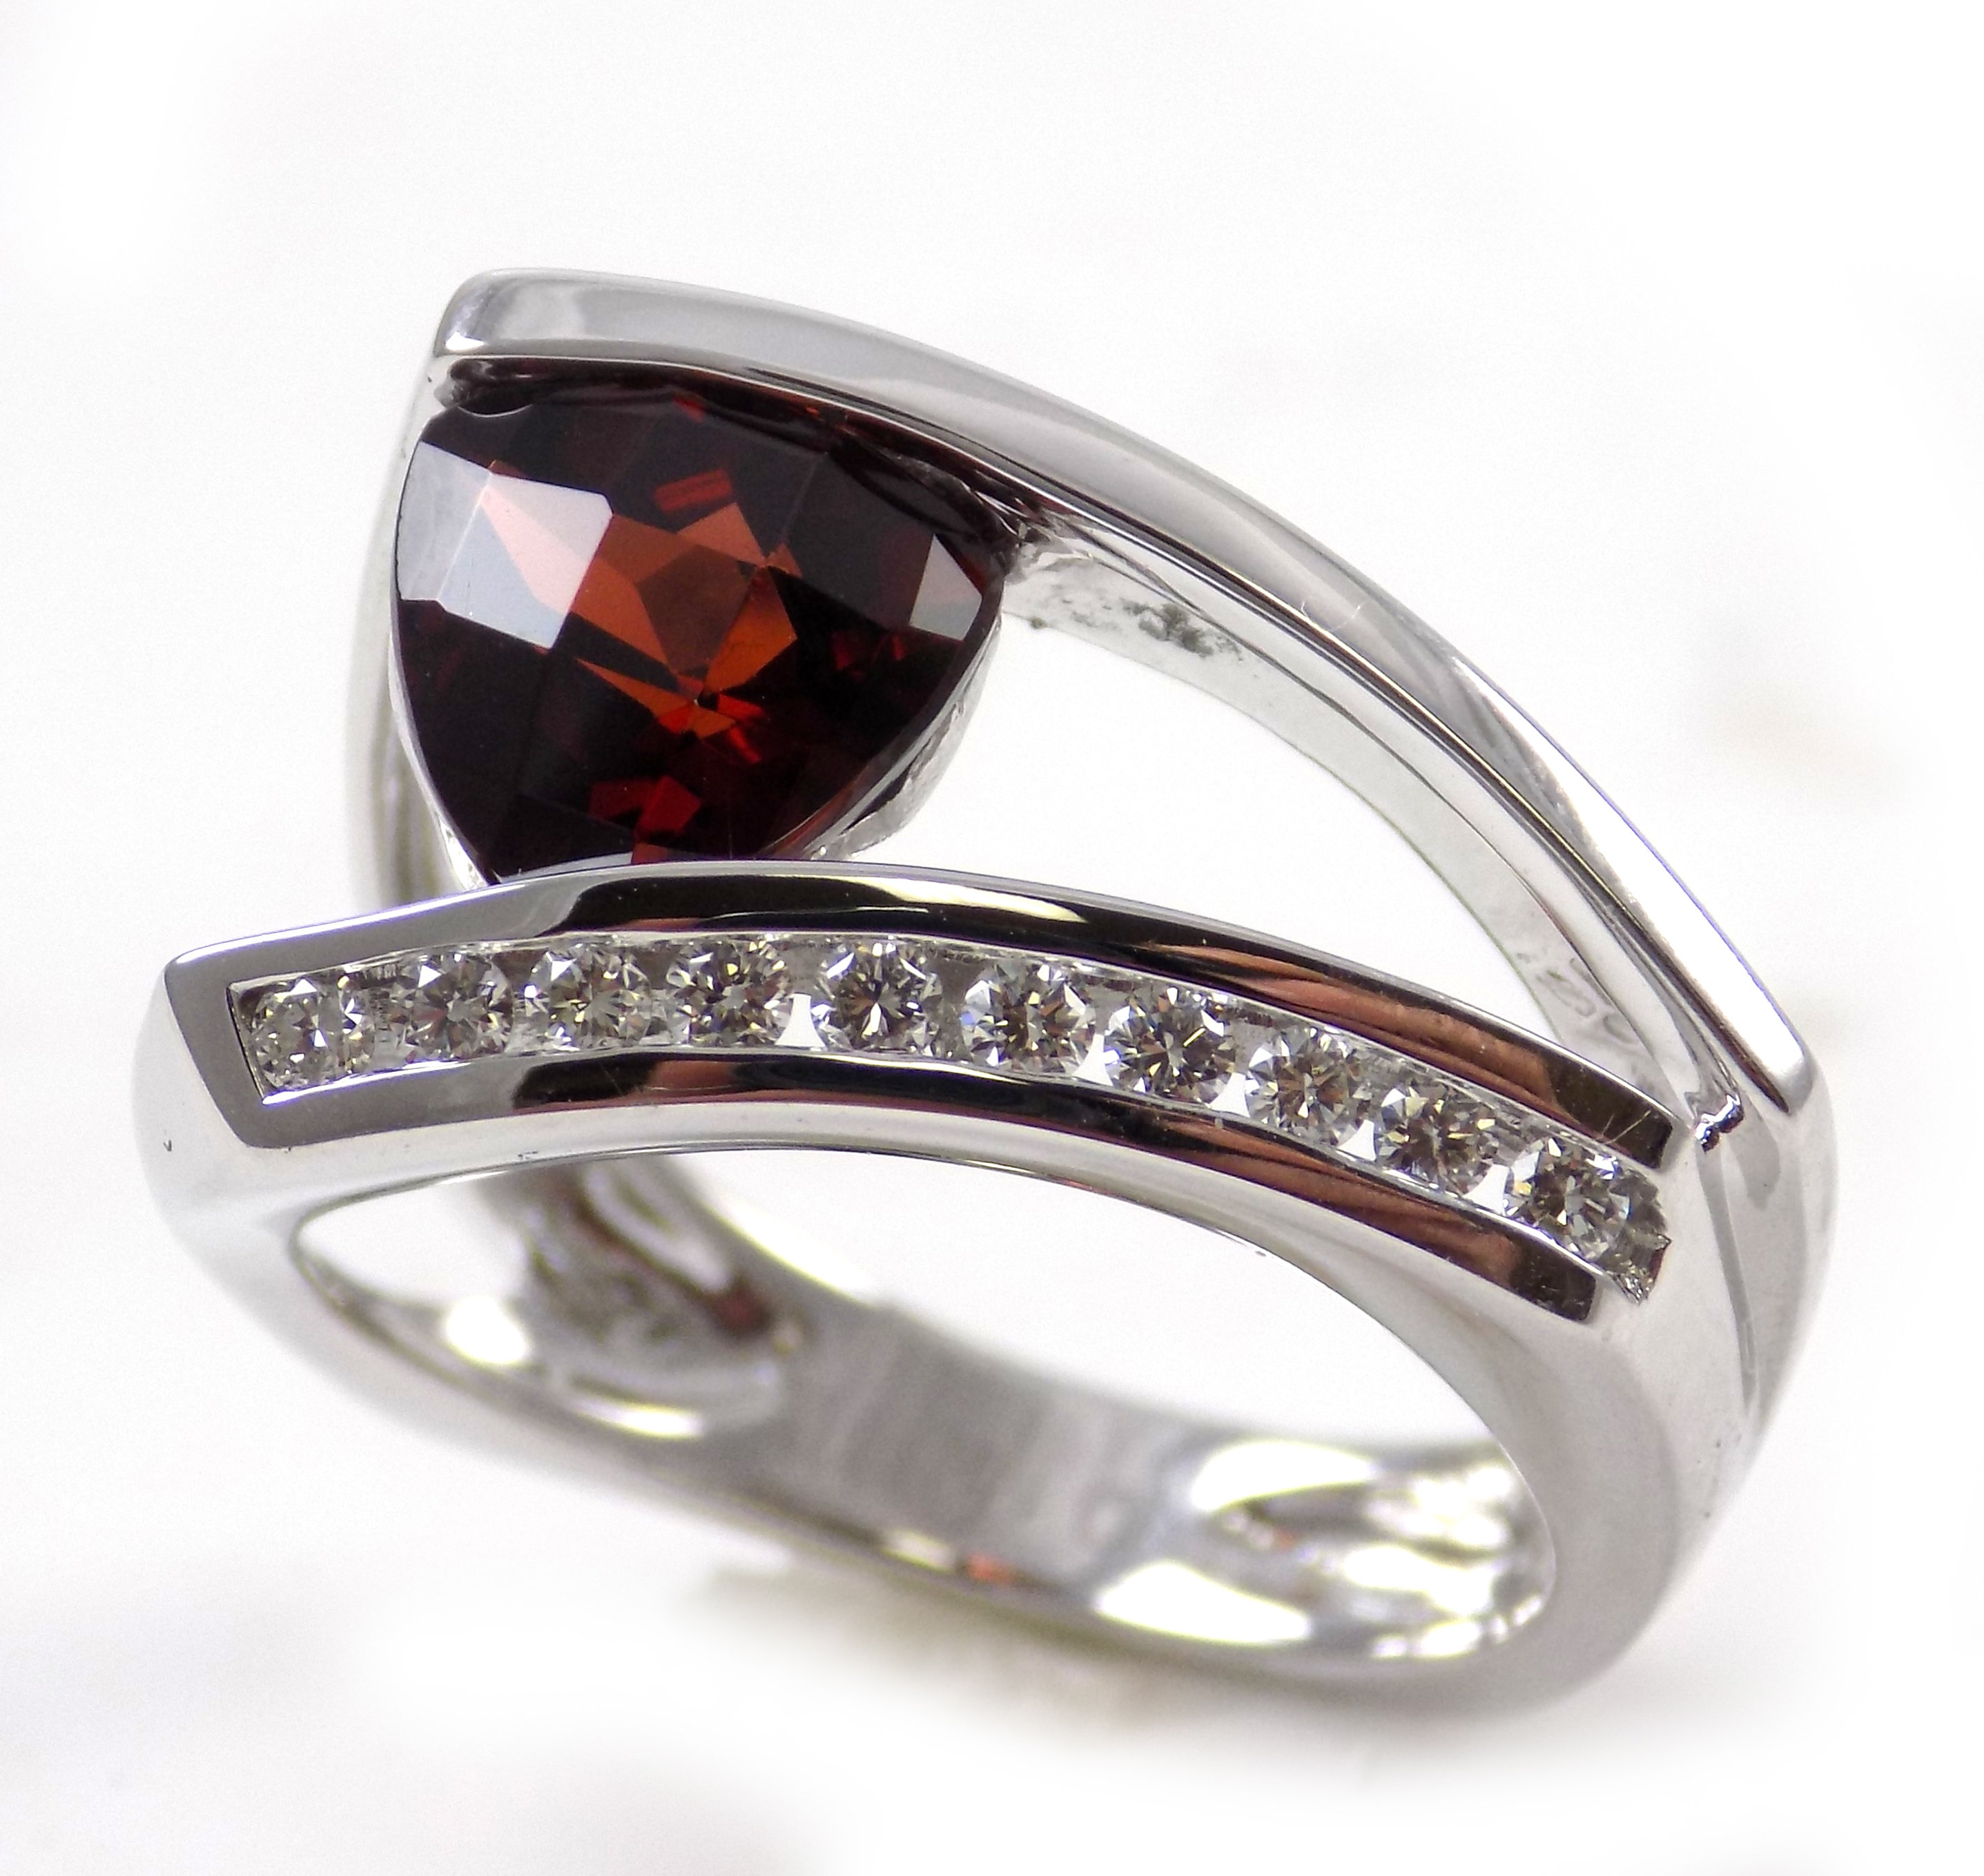 14K White Gold Garnet and Diamond Fashion Ring 200-01721